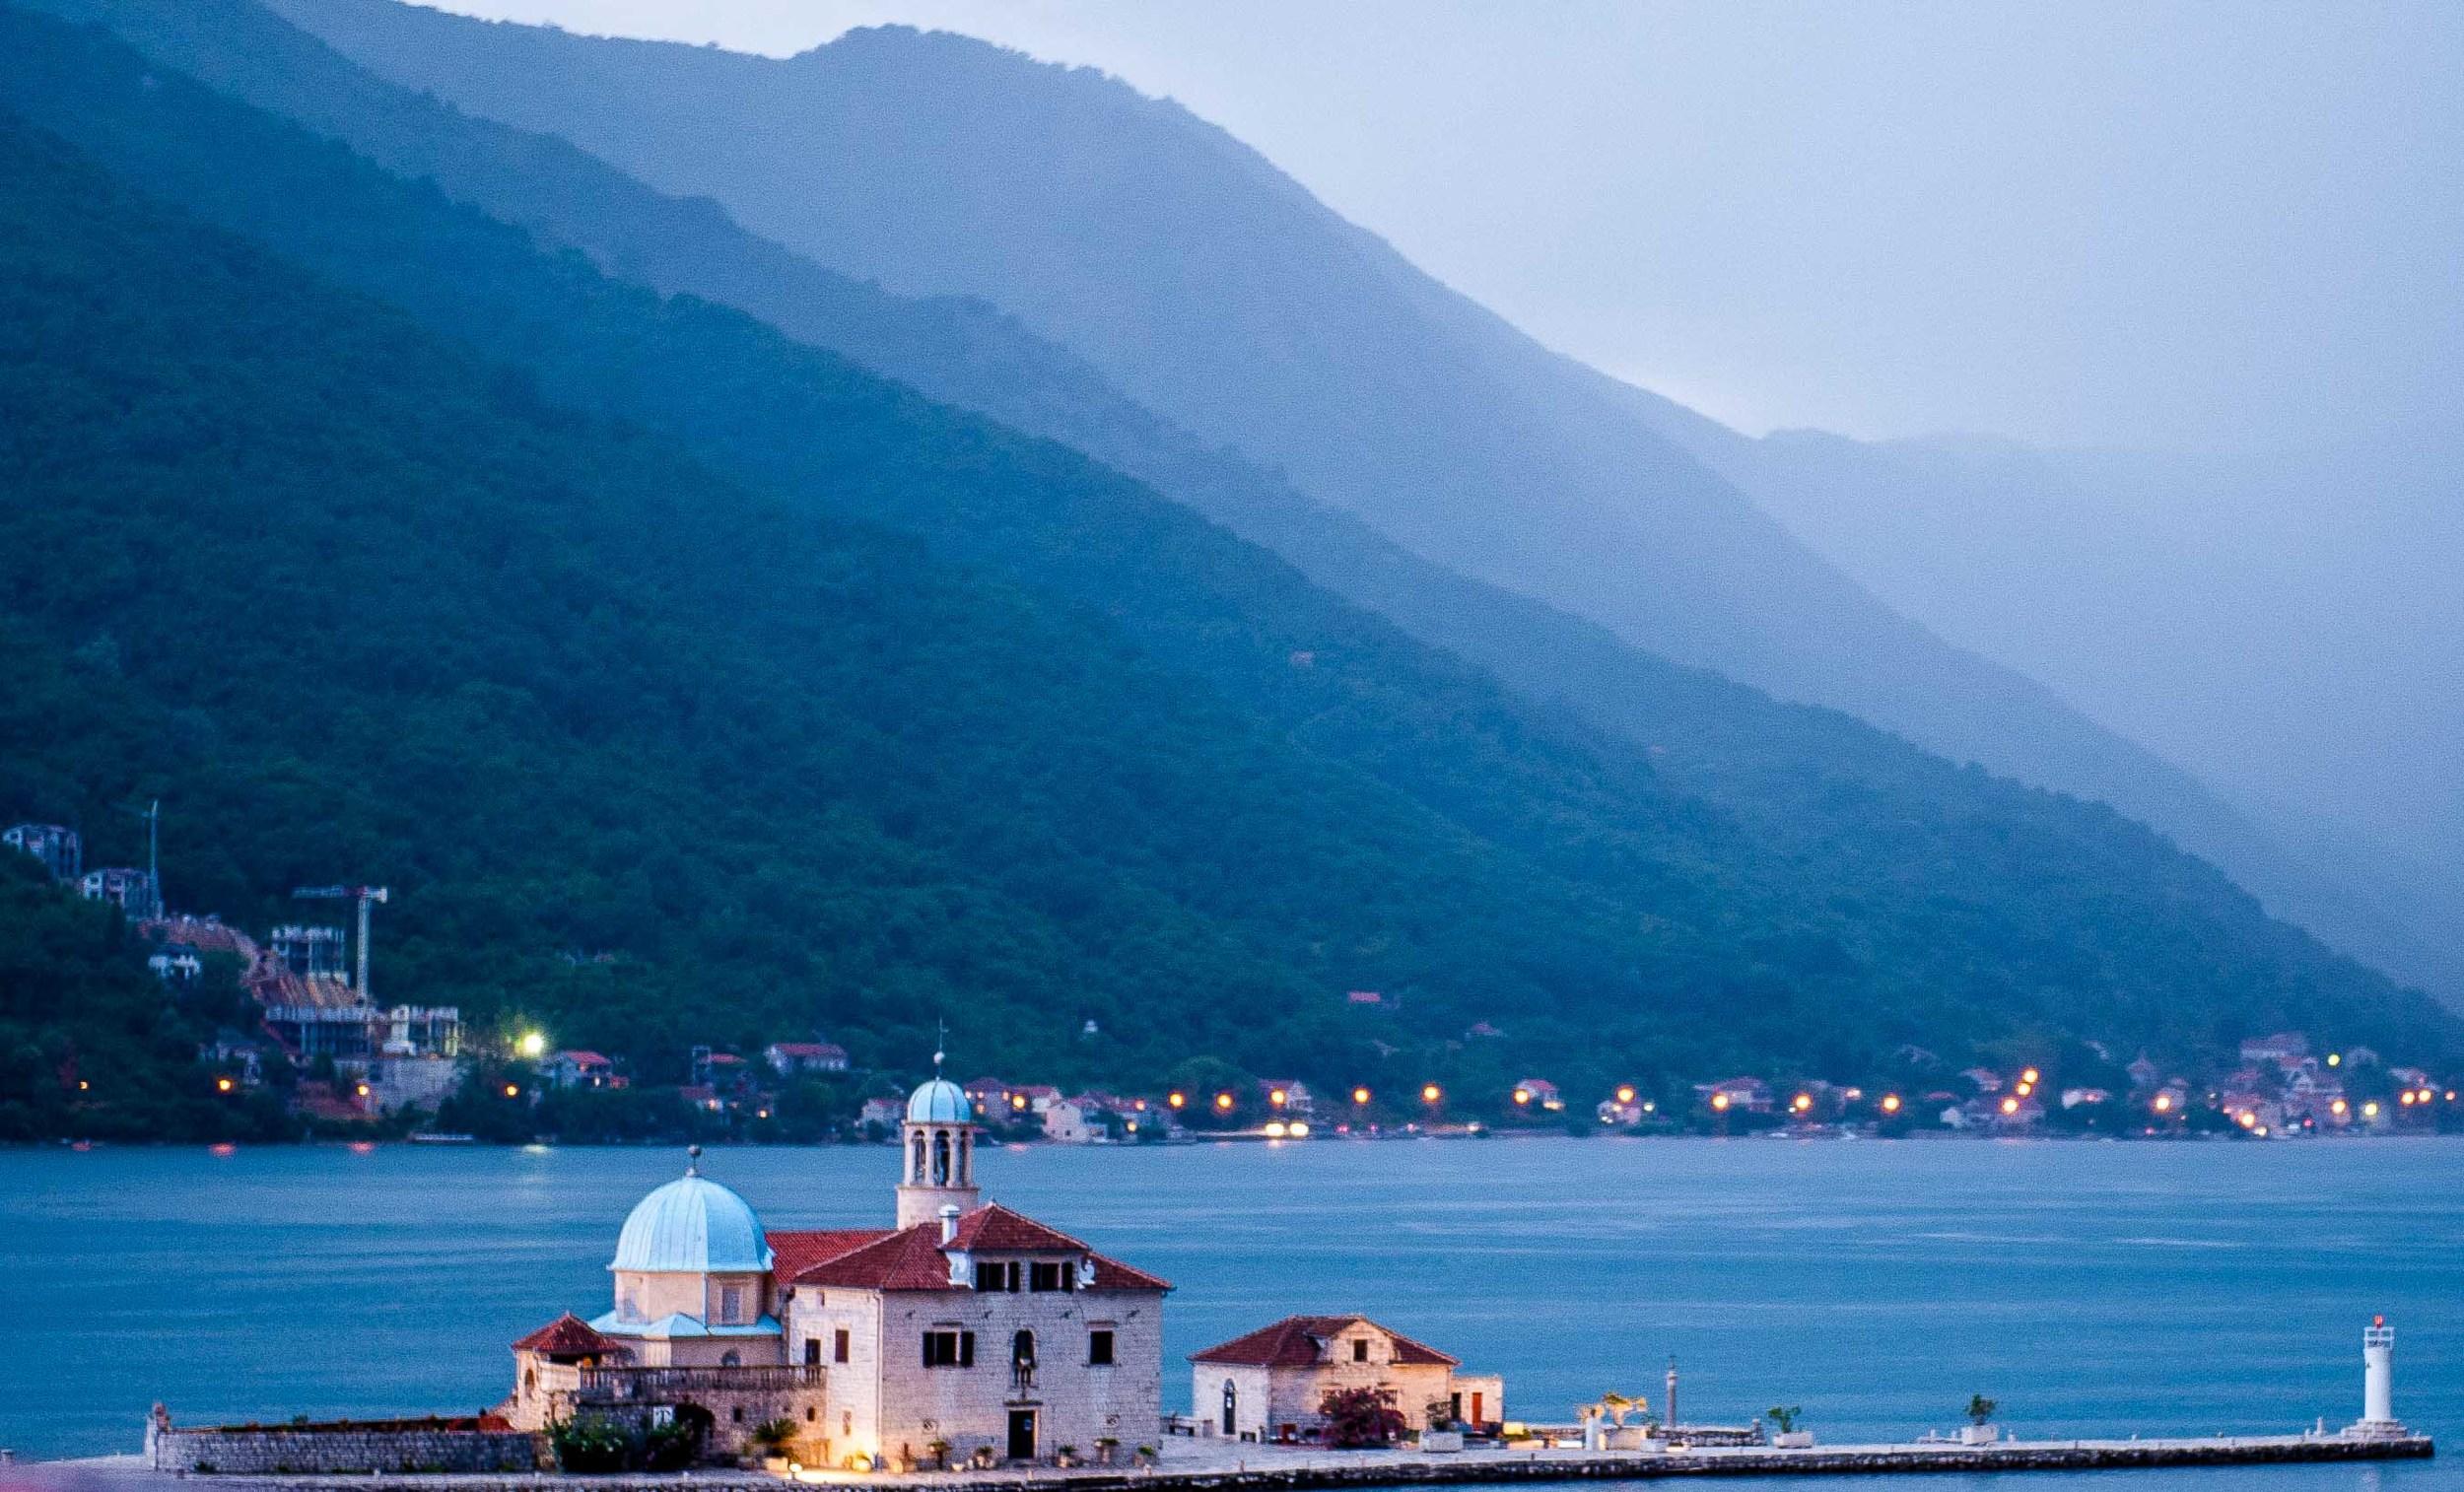 Evening in Montenegro